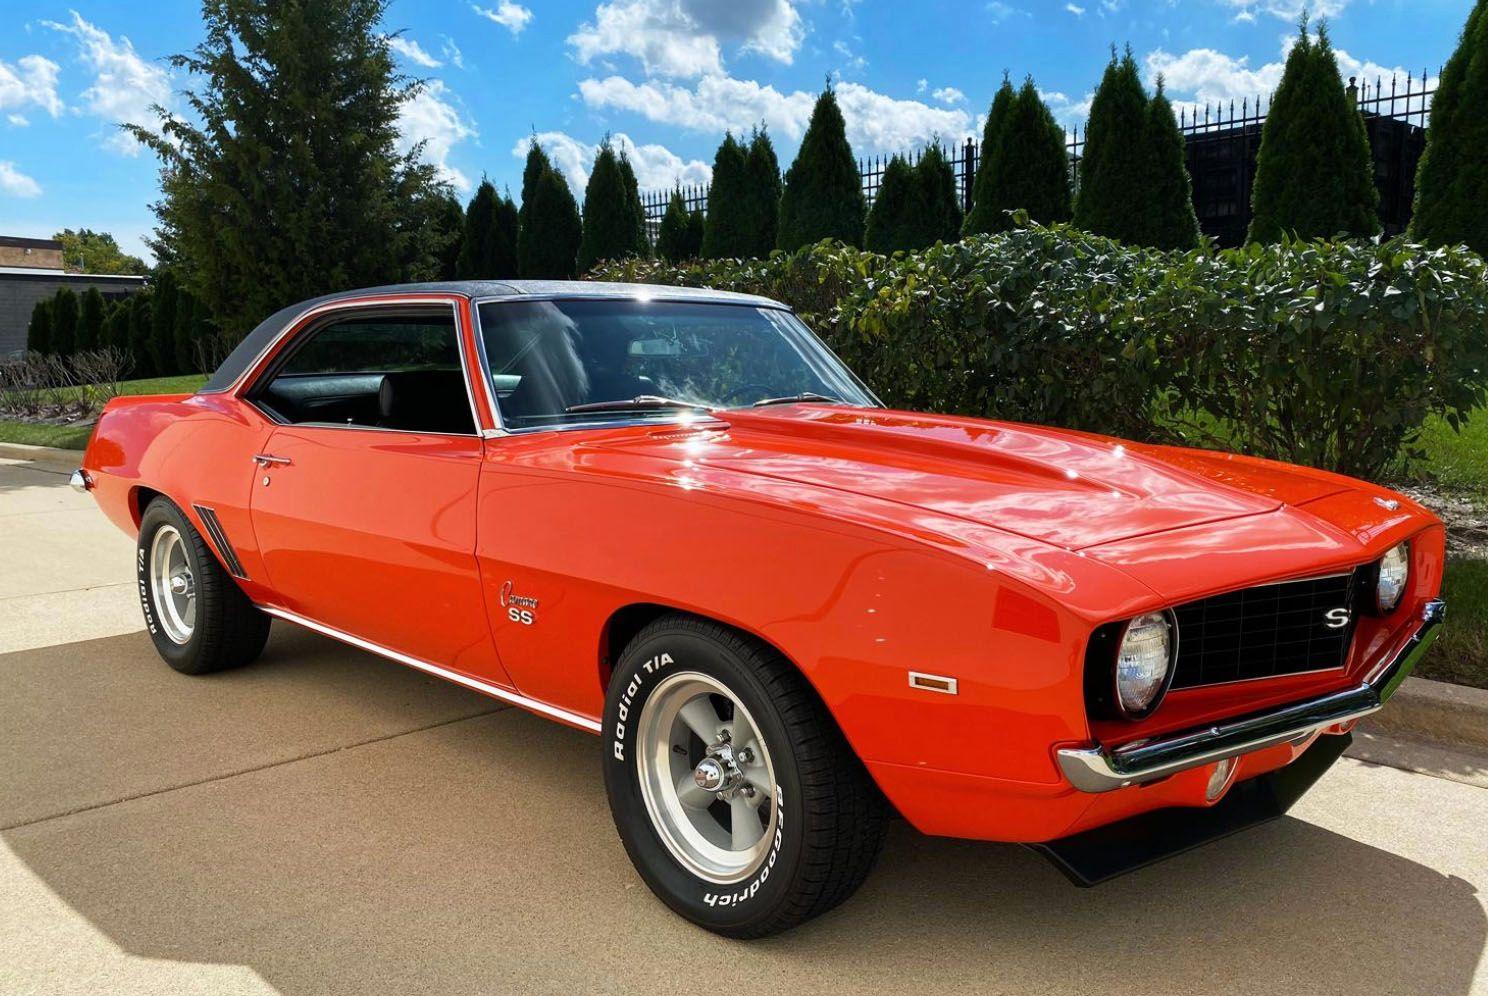 "<img src=""auction-1969-chevy-camaro-ss-396.jpg"" alt=""1969 Chevrolet Camaro SS 396 Coupe in Hugger Orange"">"